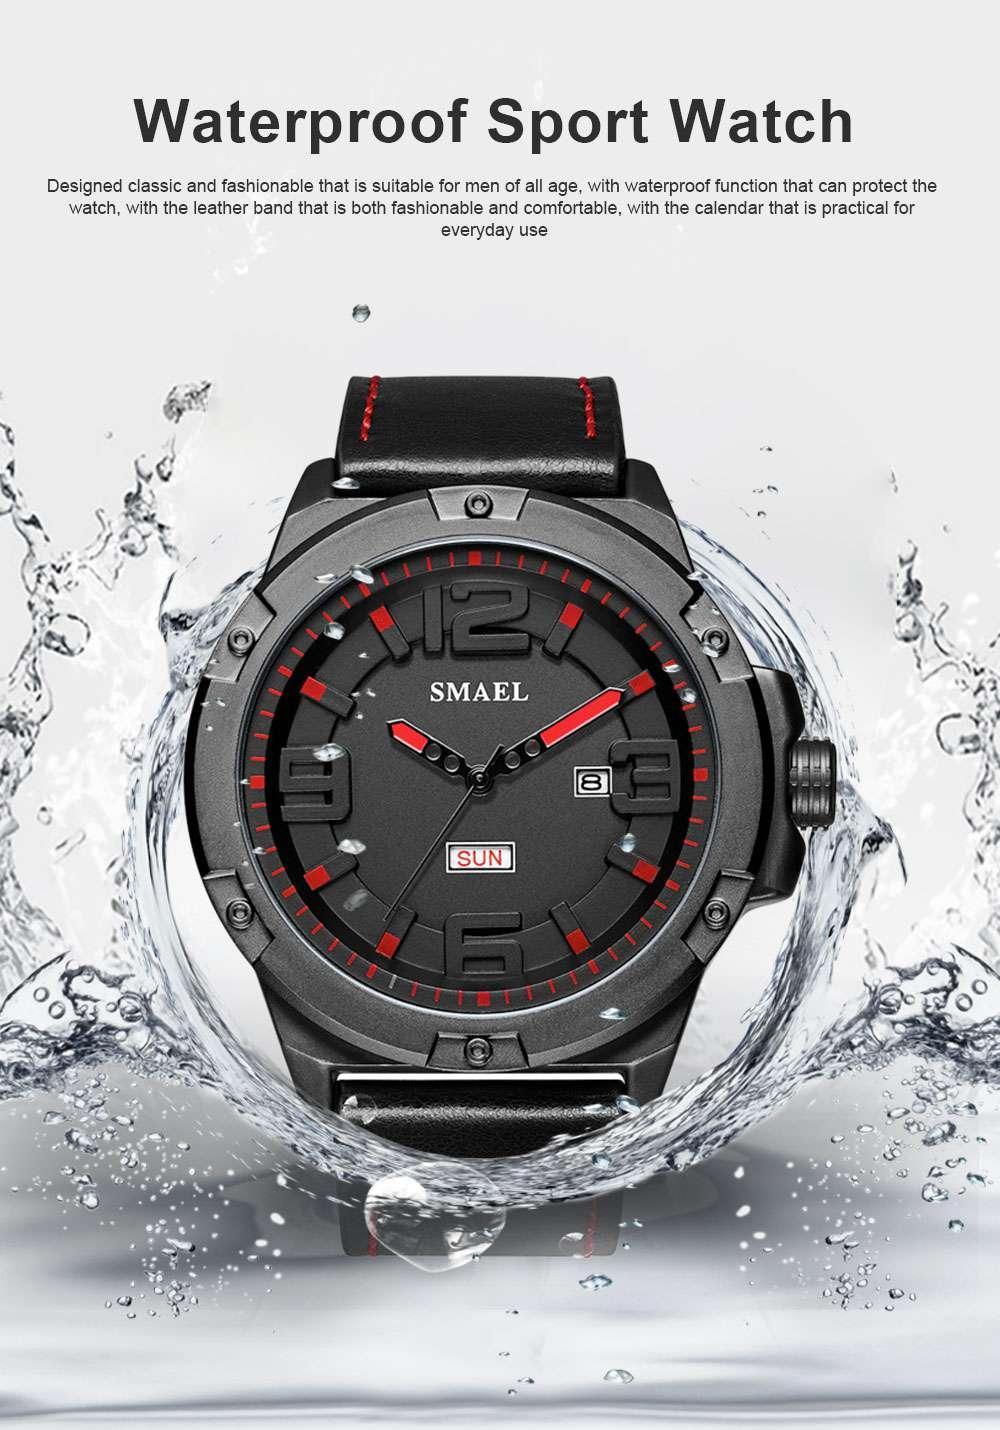 Waterproof Sport Watch with Calendar, Multifunctional Leather Band Sport Watchfor Men 0